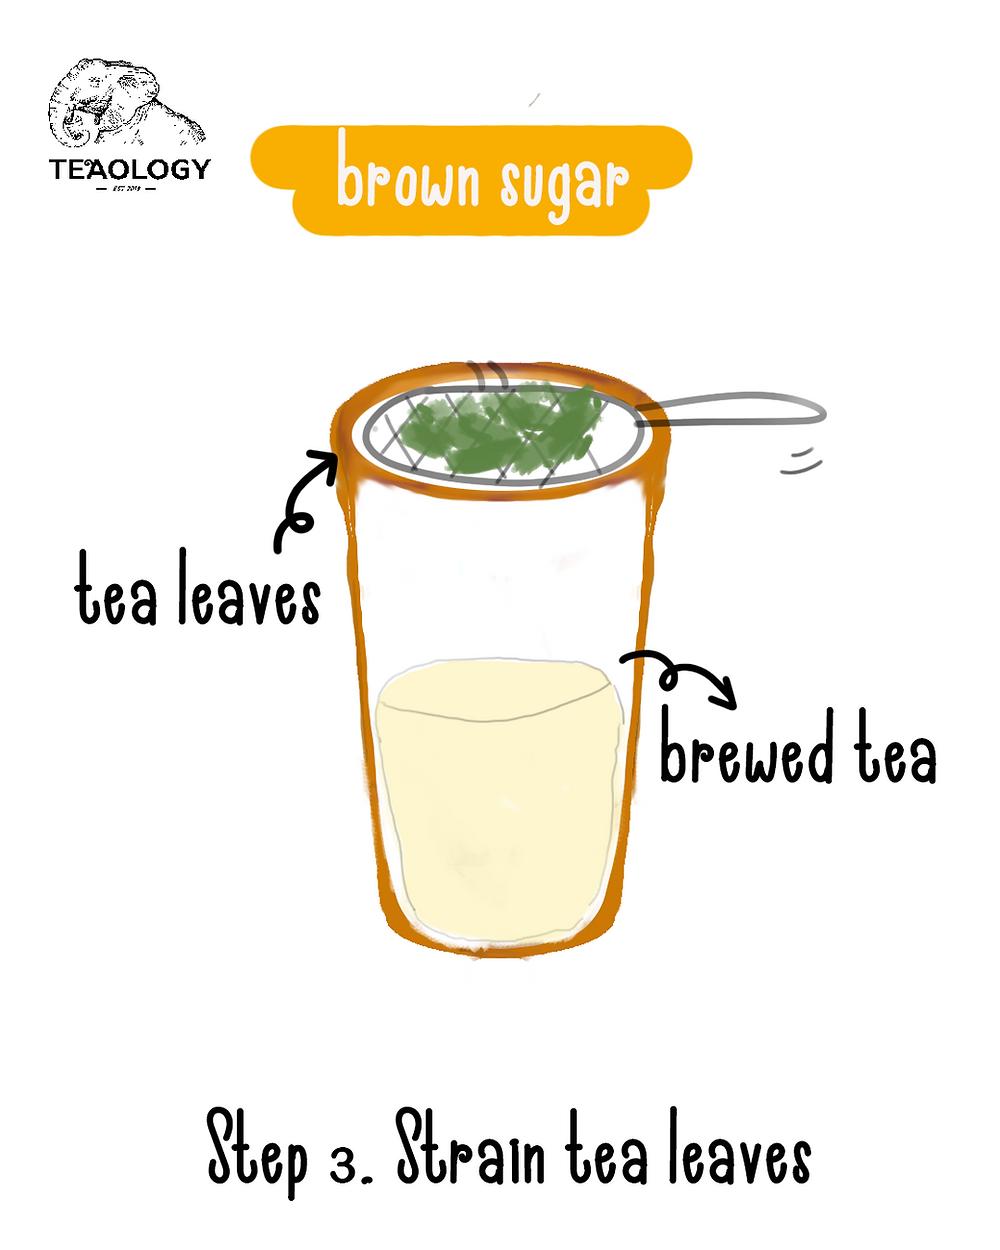 Step 3 to make brown sugar boba - Strain tea leaves